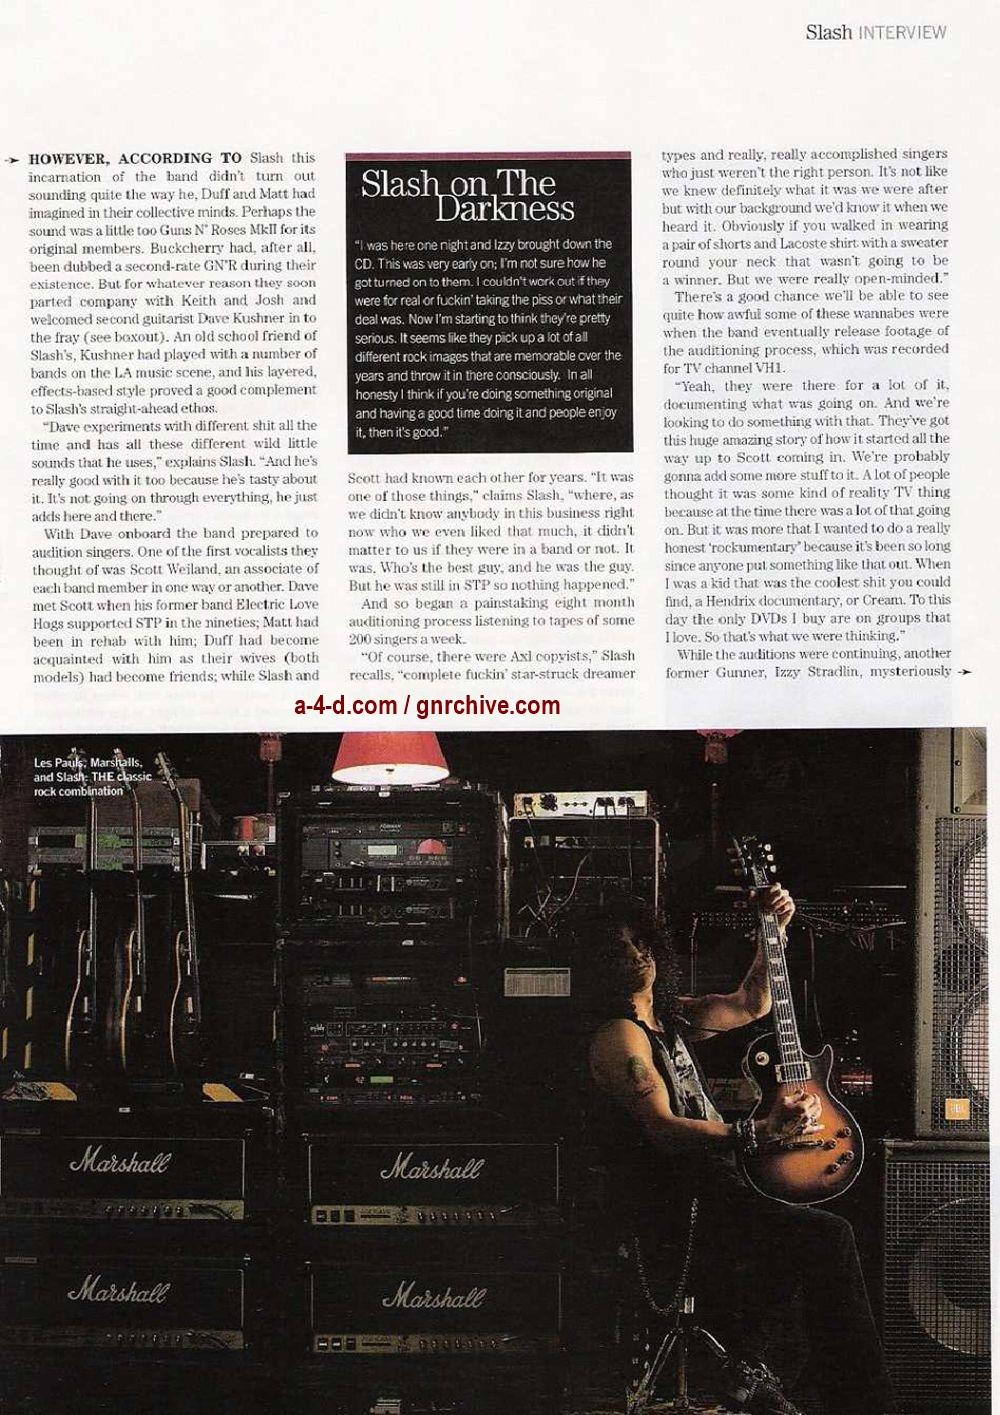 2004.07.DD - Guitarist Magazine - Top Gun (Slash, Duff) 2004-040